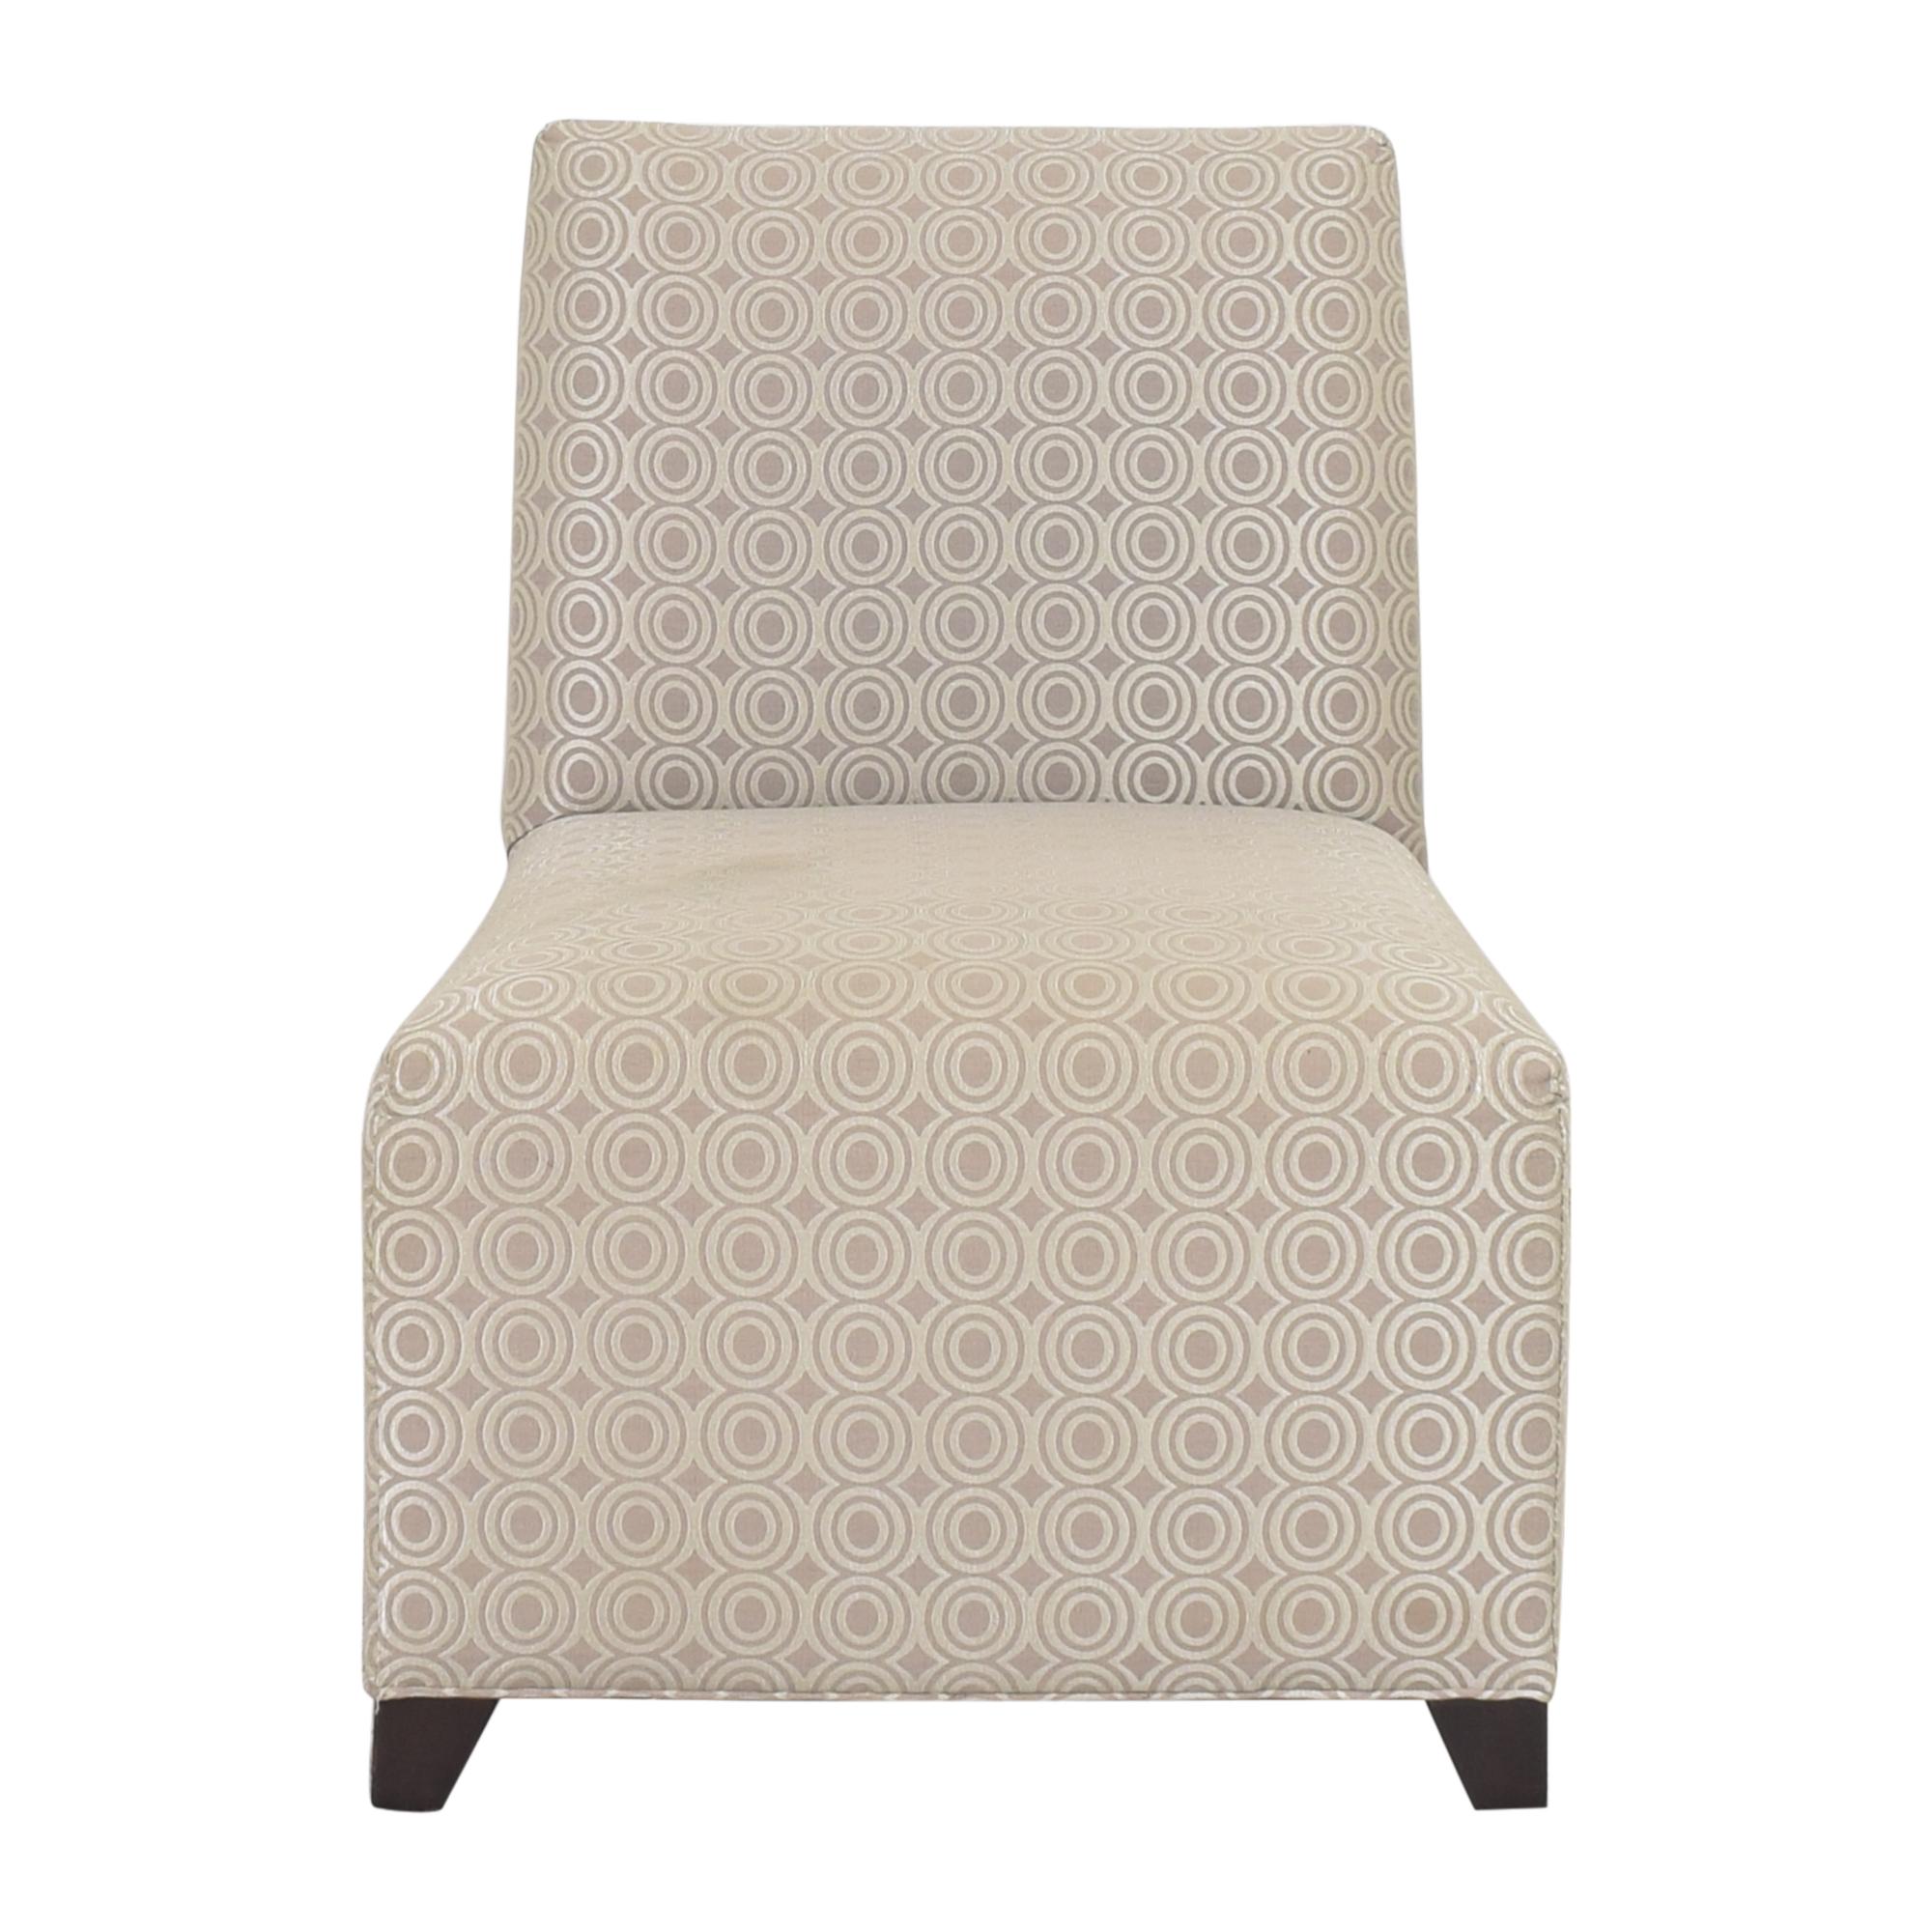 buy Ethan Allen Slipper Accent Chair with Ottoman Ethan Allen Chairs